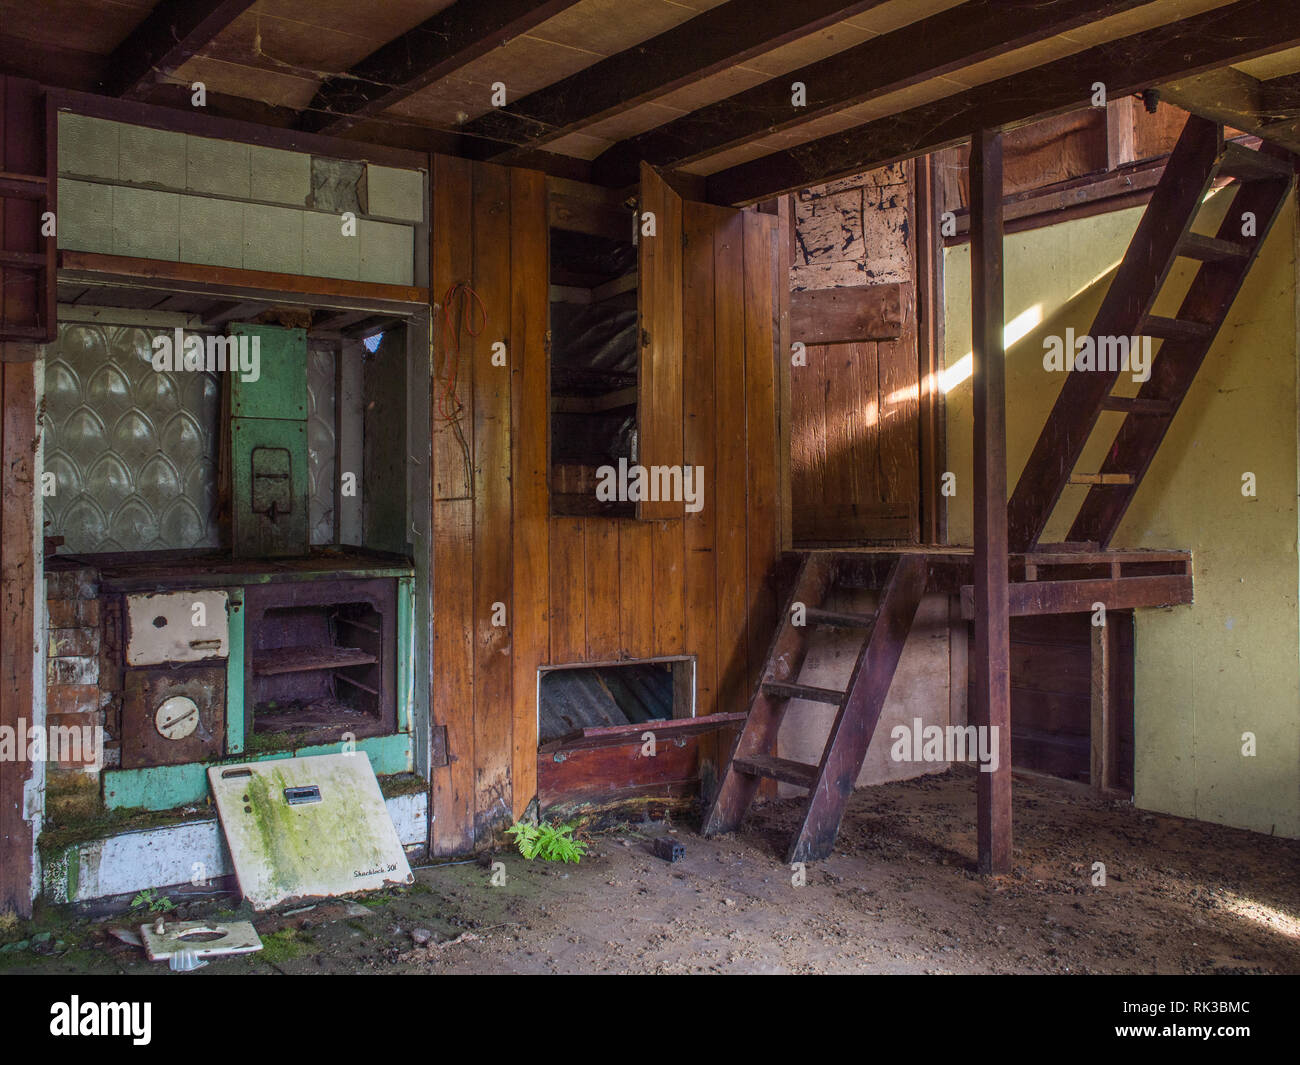 Broken wood stove and ladders to loft, interior of abandoned house, Ahu Ahu Ohu, Whanganui River, North Island, New Zealand - Stock Image